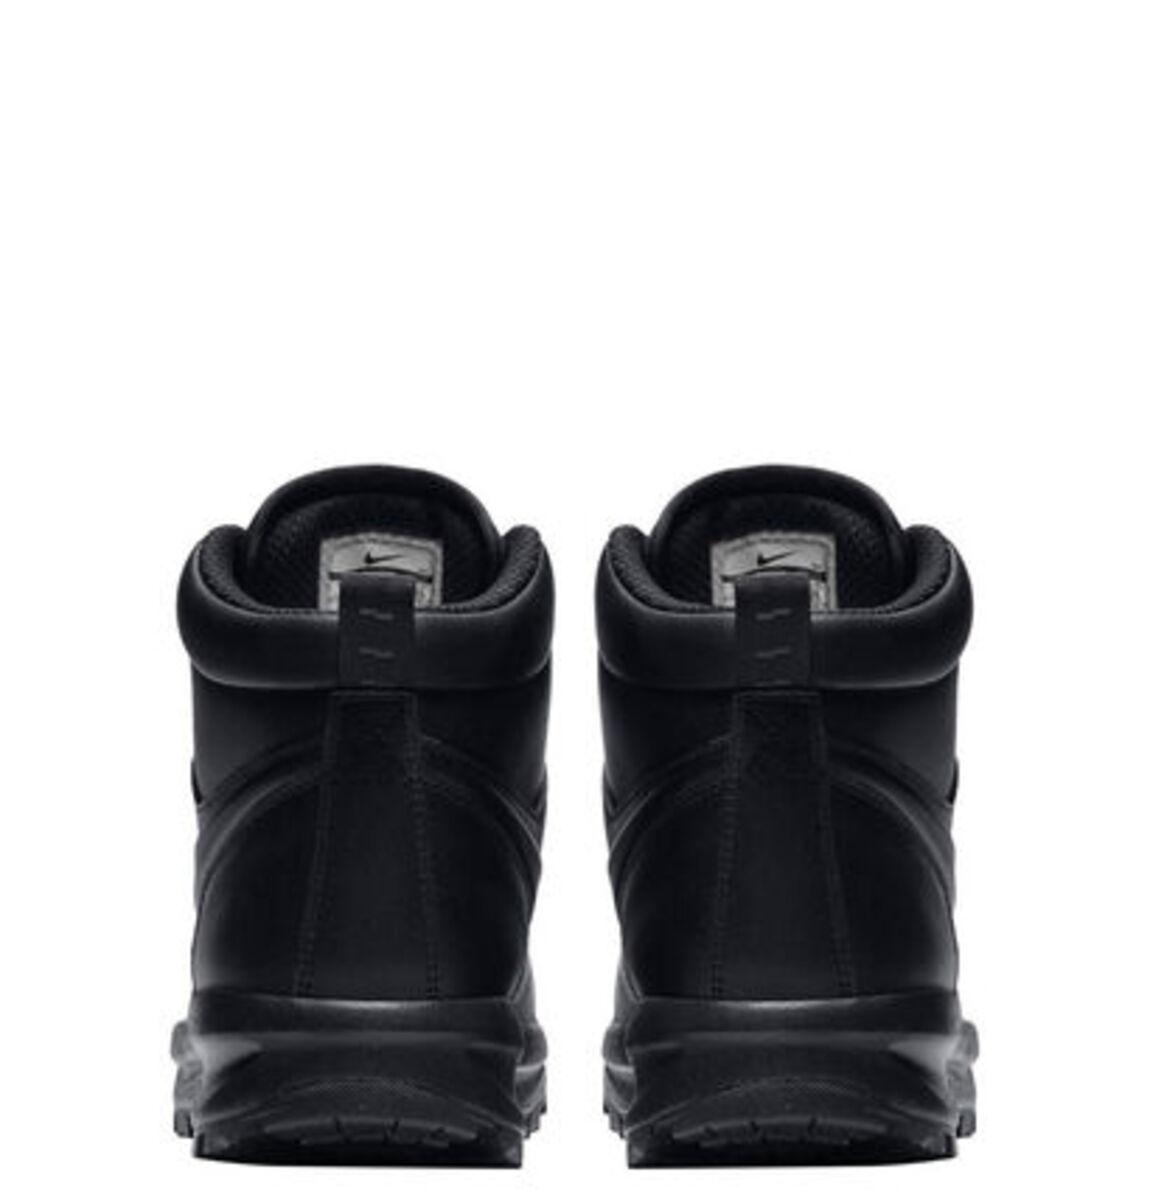 Bild 4 von Nike Herren Boots Manoa